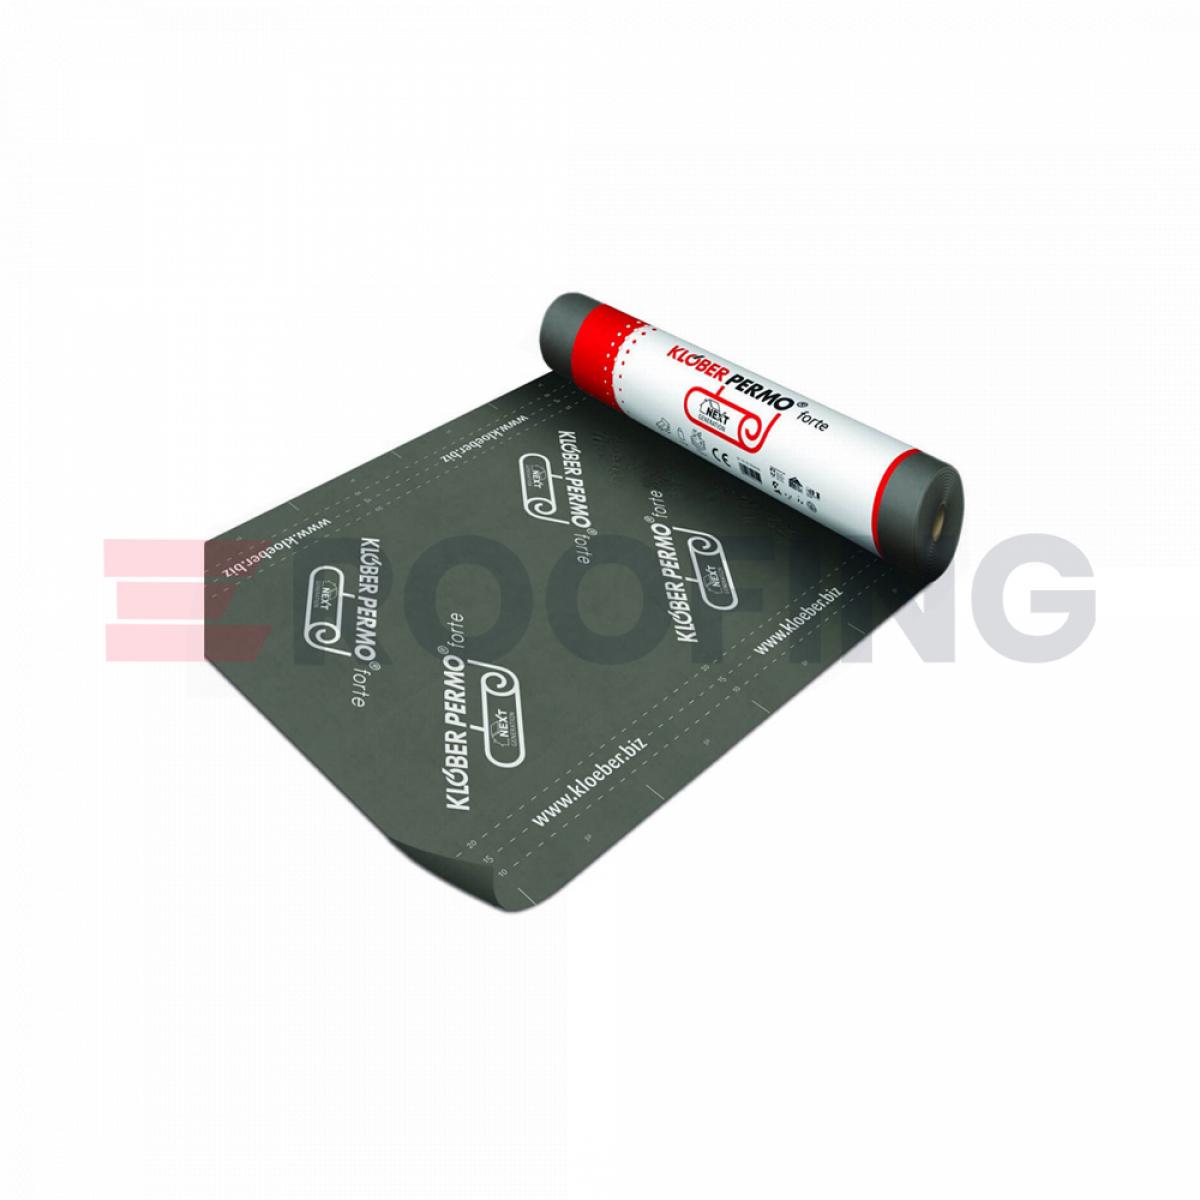 Klober Permo Forte Breathable Membrane